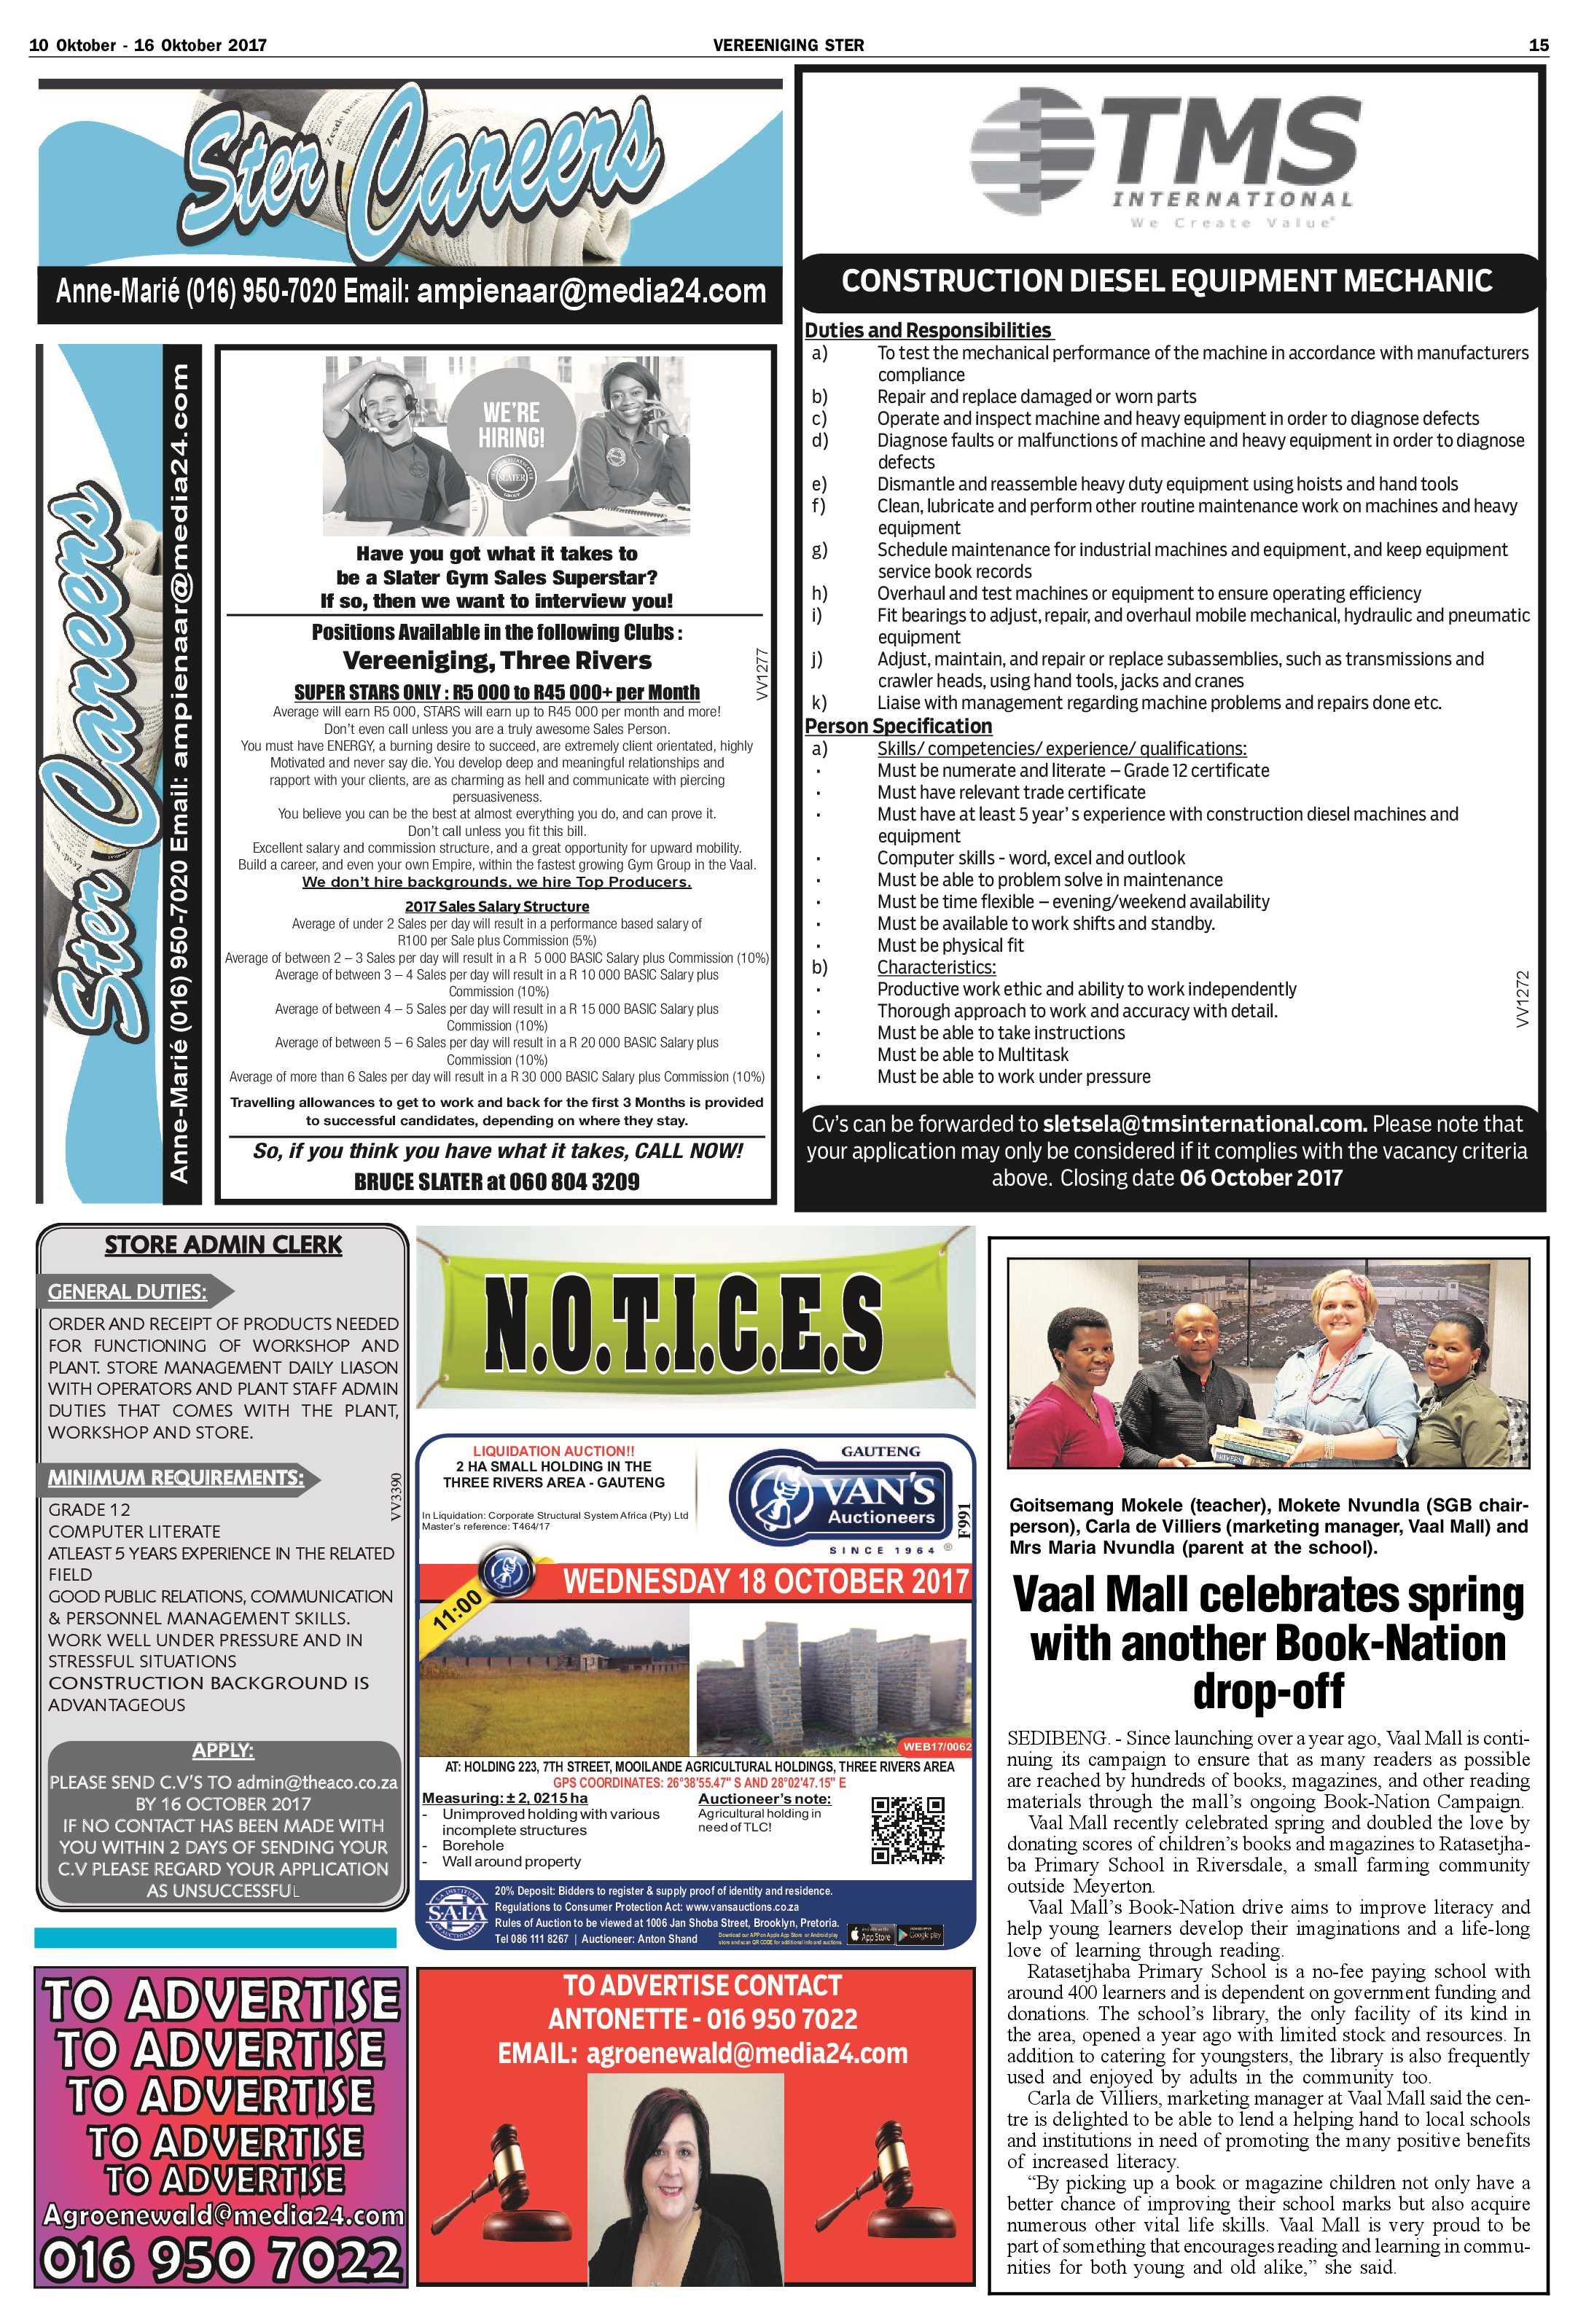 vereeniging-ster-10-16-oktober-2017-epapers-page-15